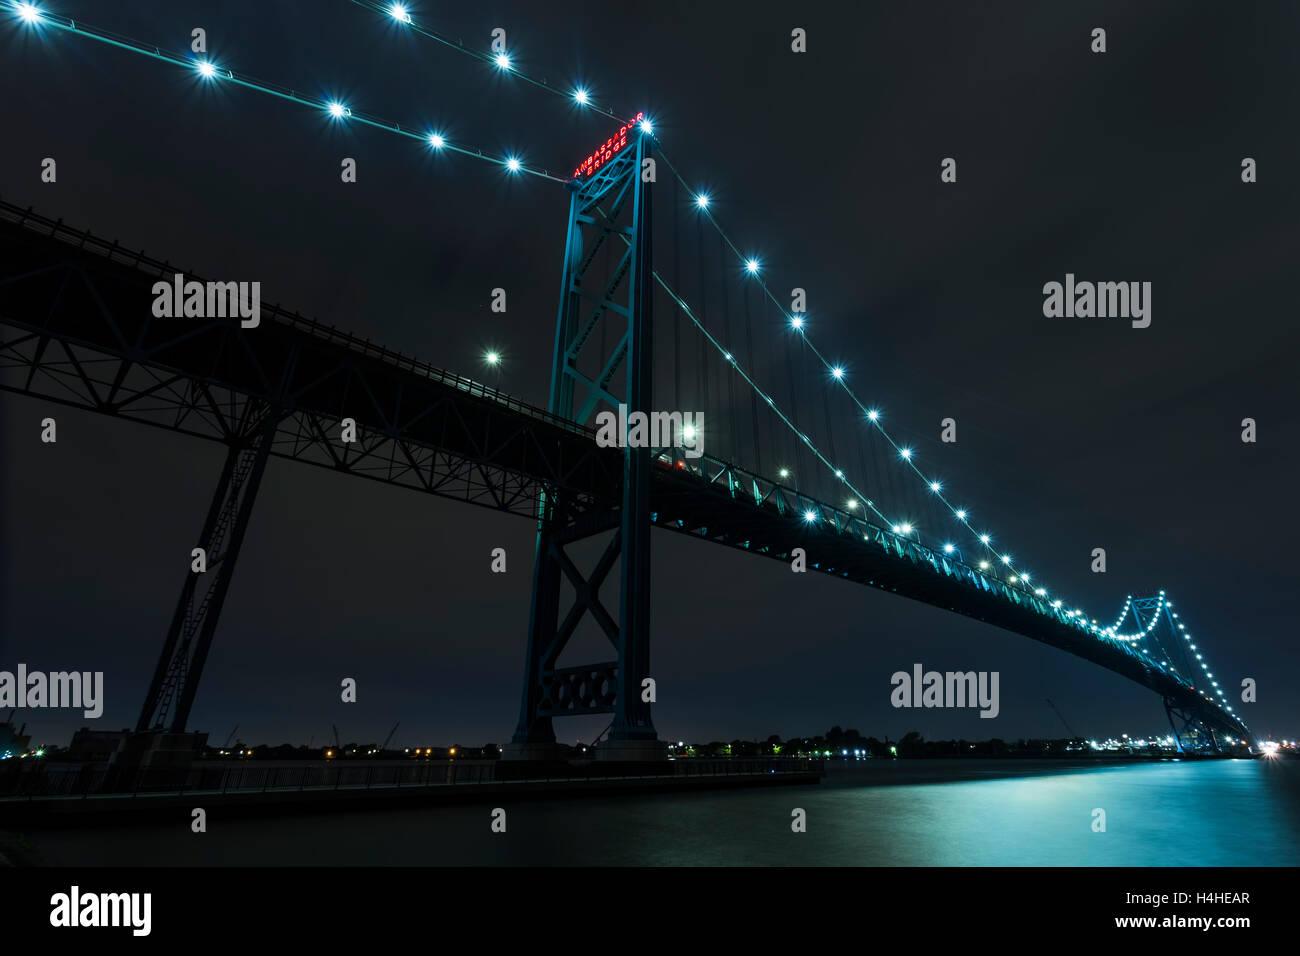 Ambassador Bridge connecting Windsor, Ontario to Detroit Michigan at night. - Stock Image